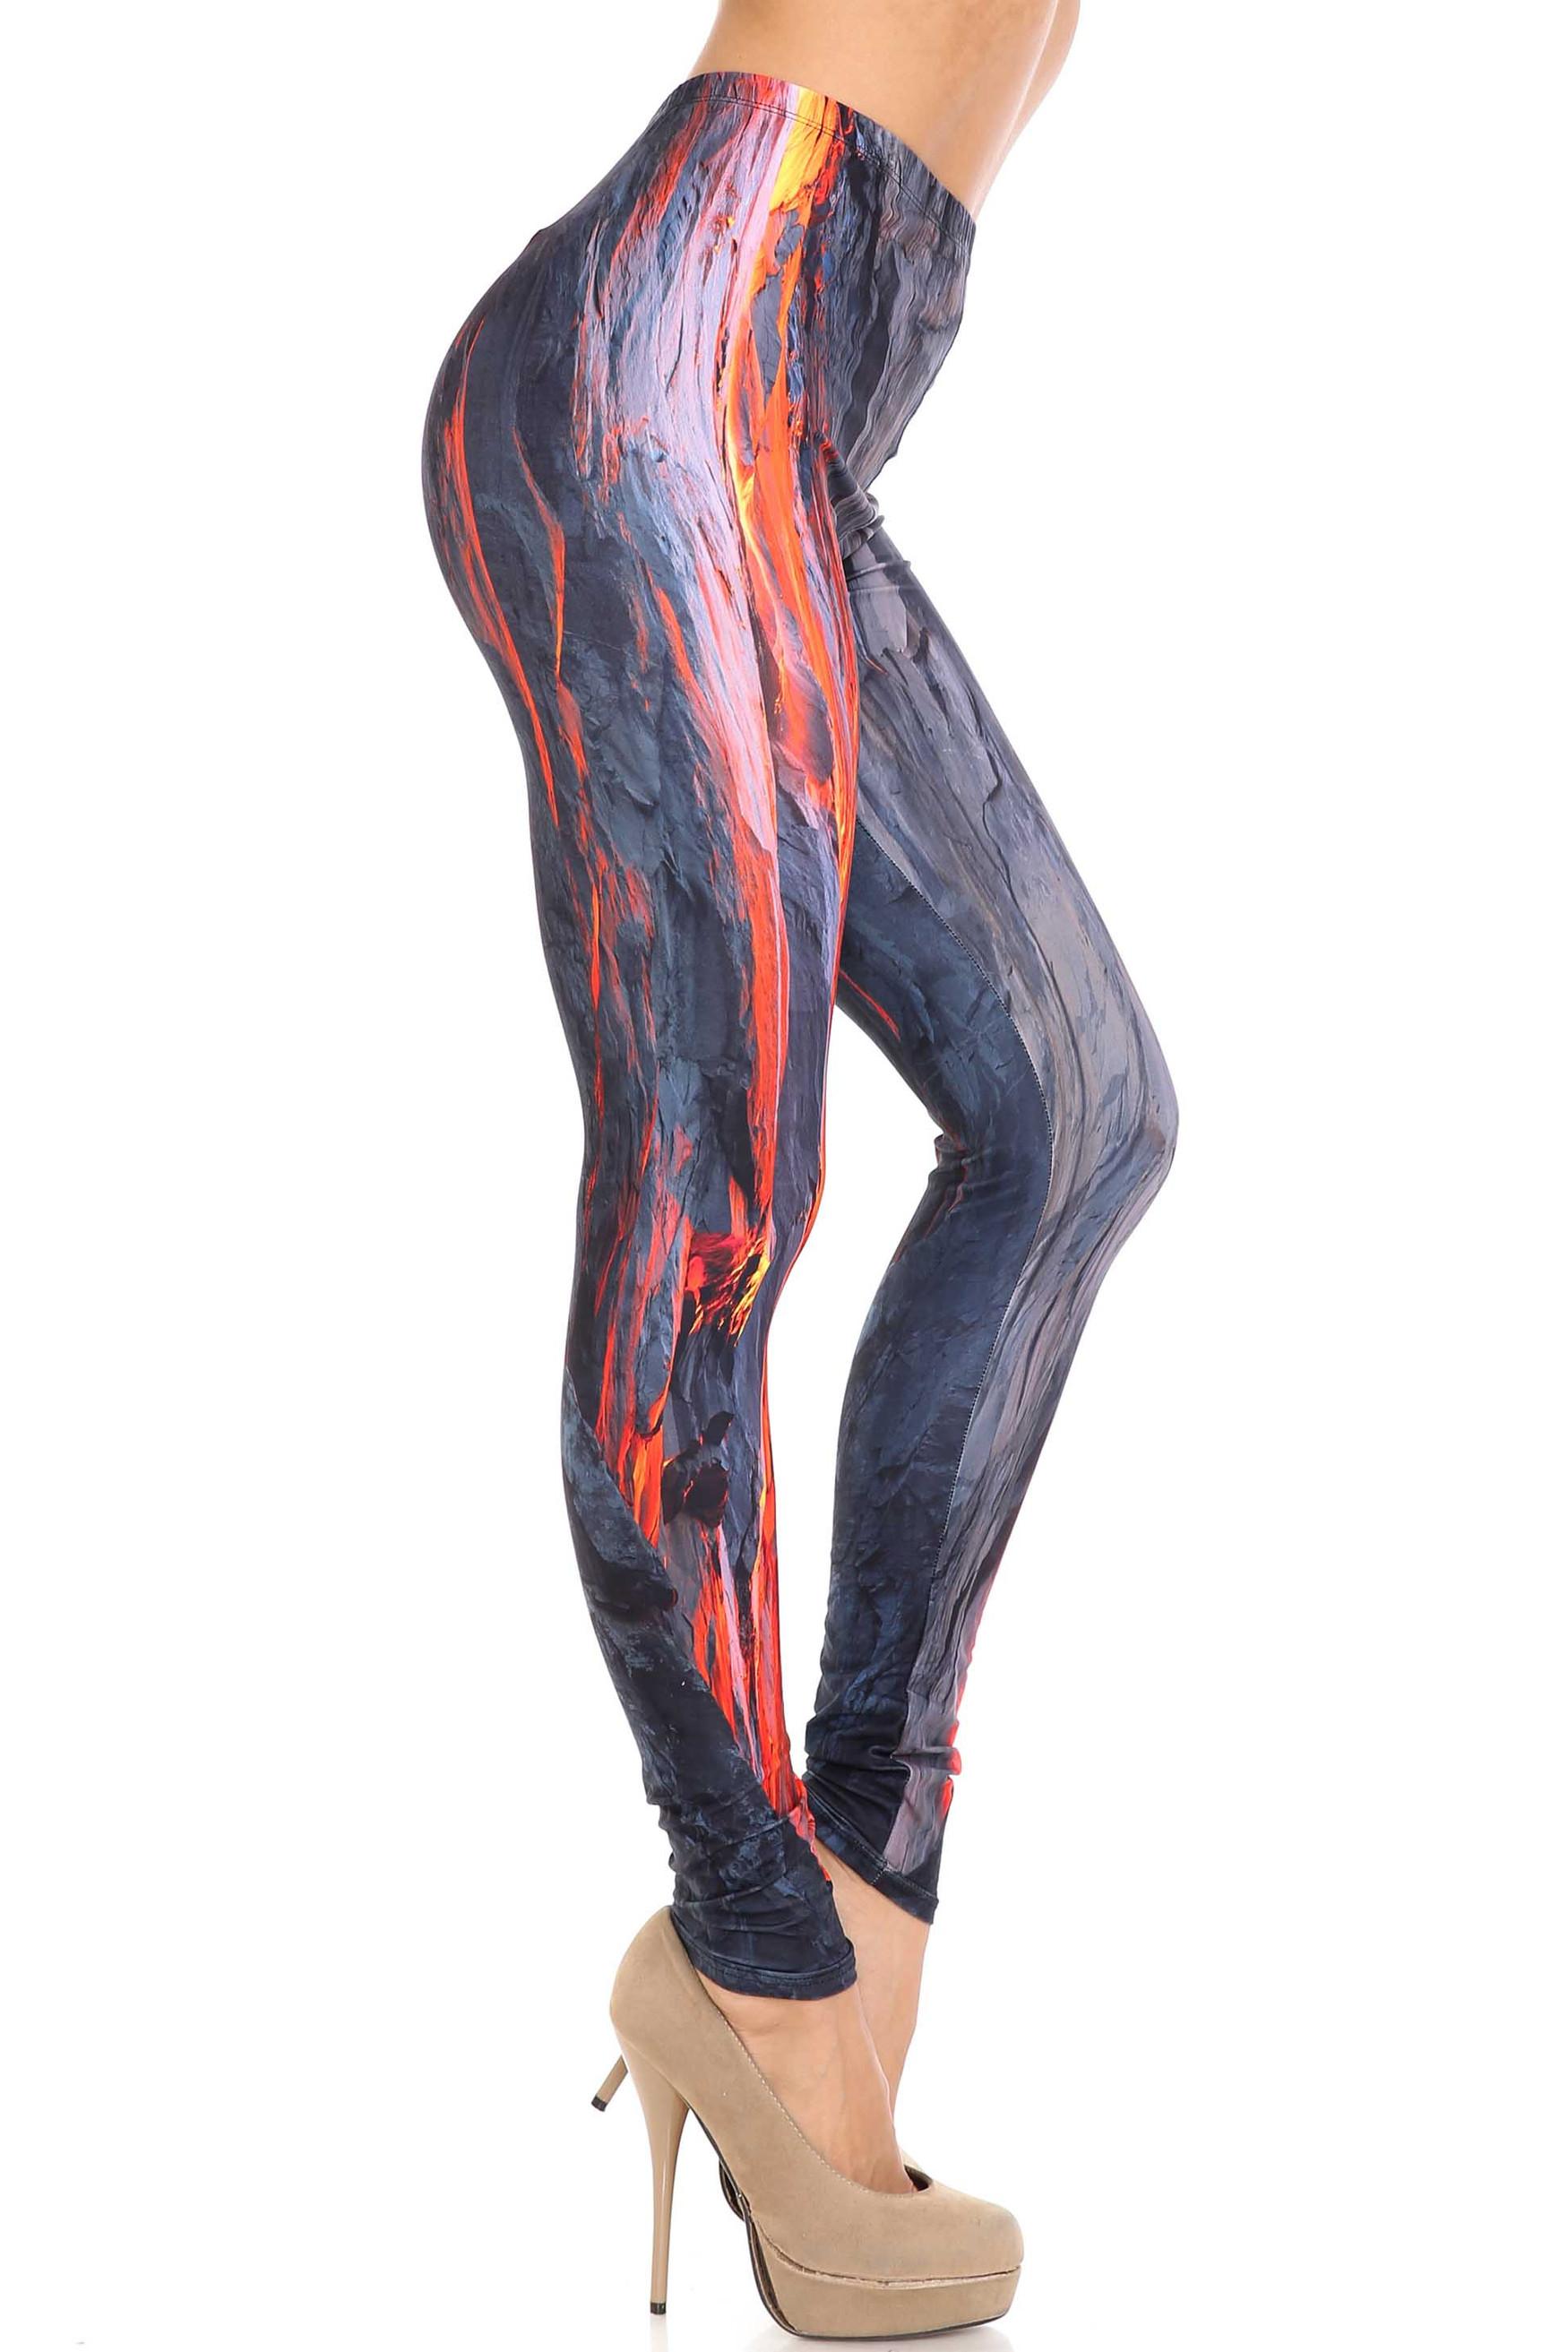 Creamy Soft Hot Lava Leggings - By USA Fashion™